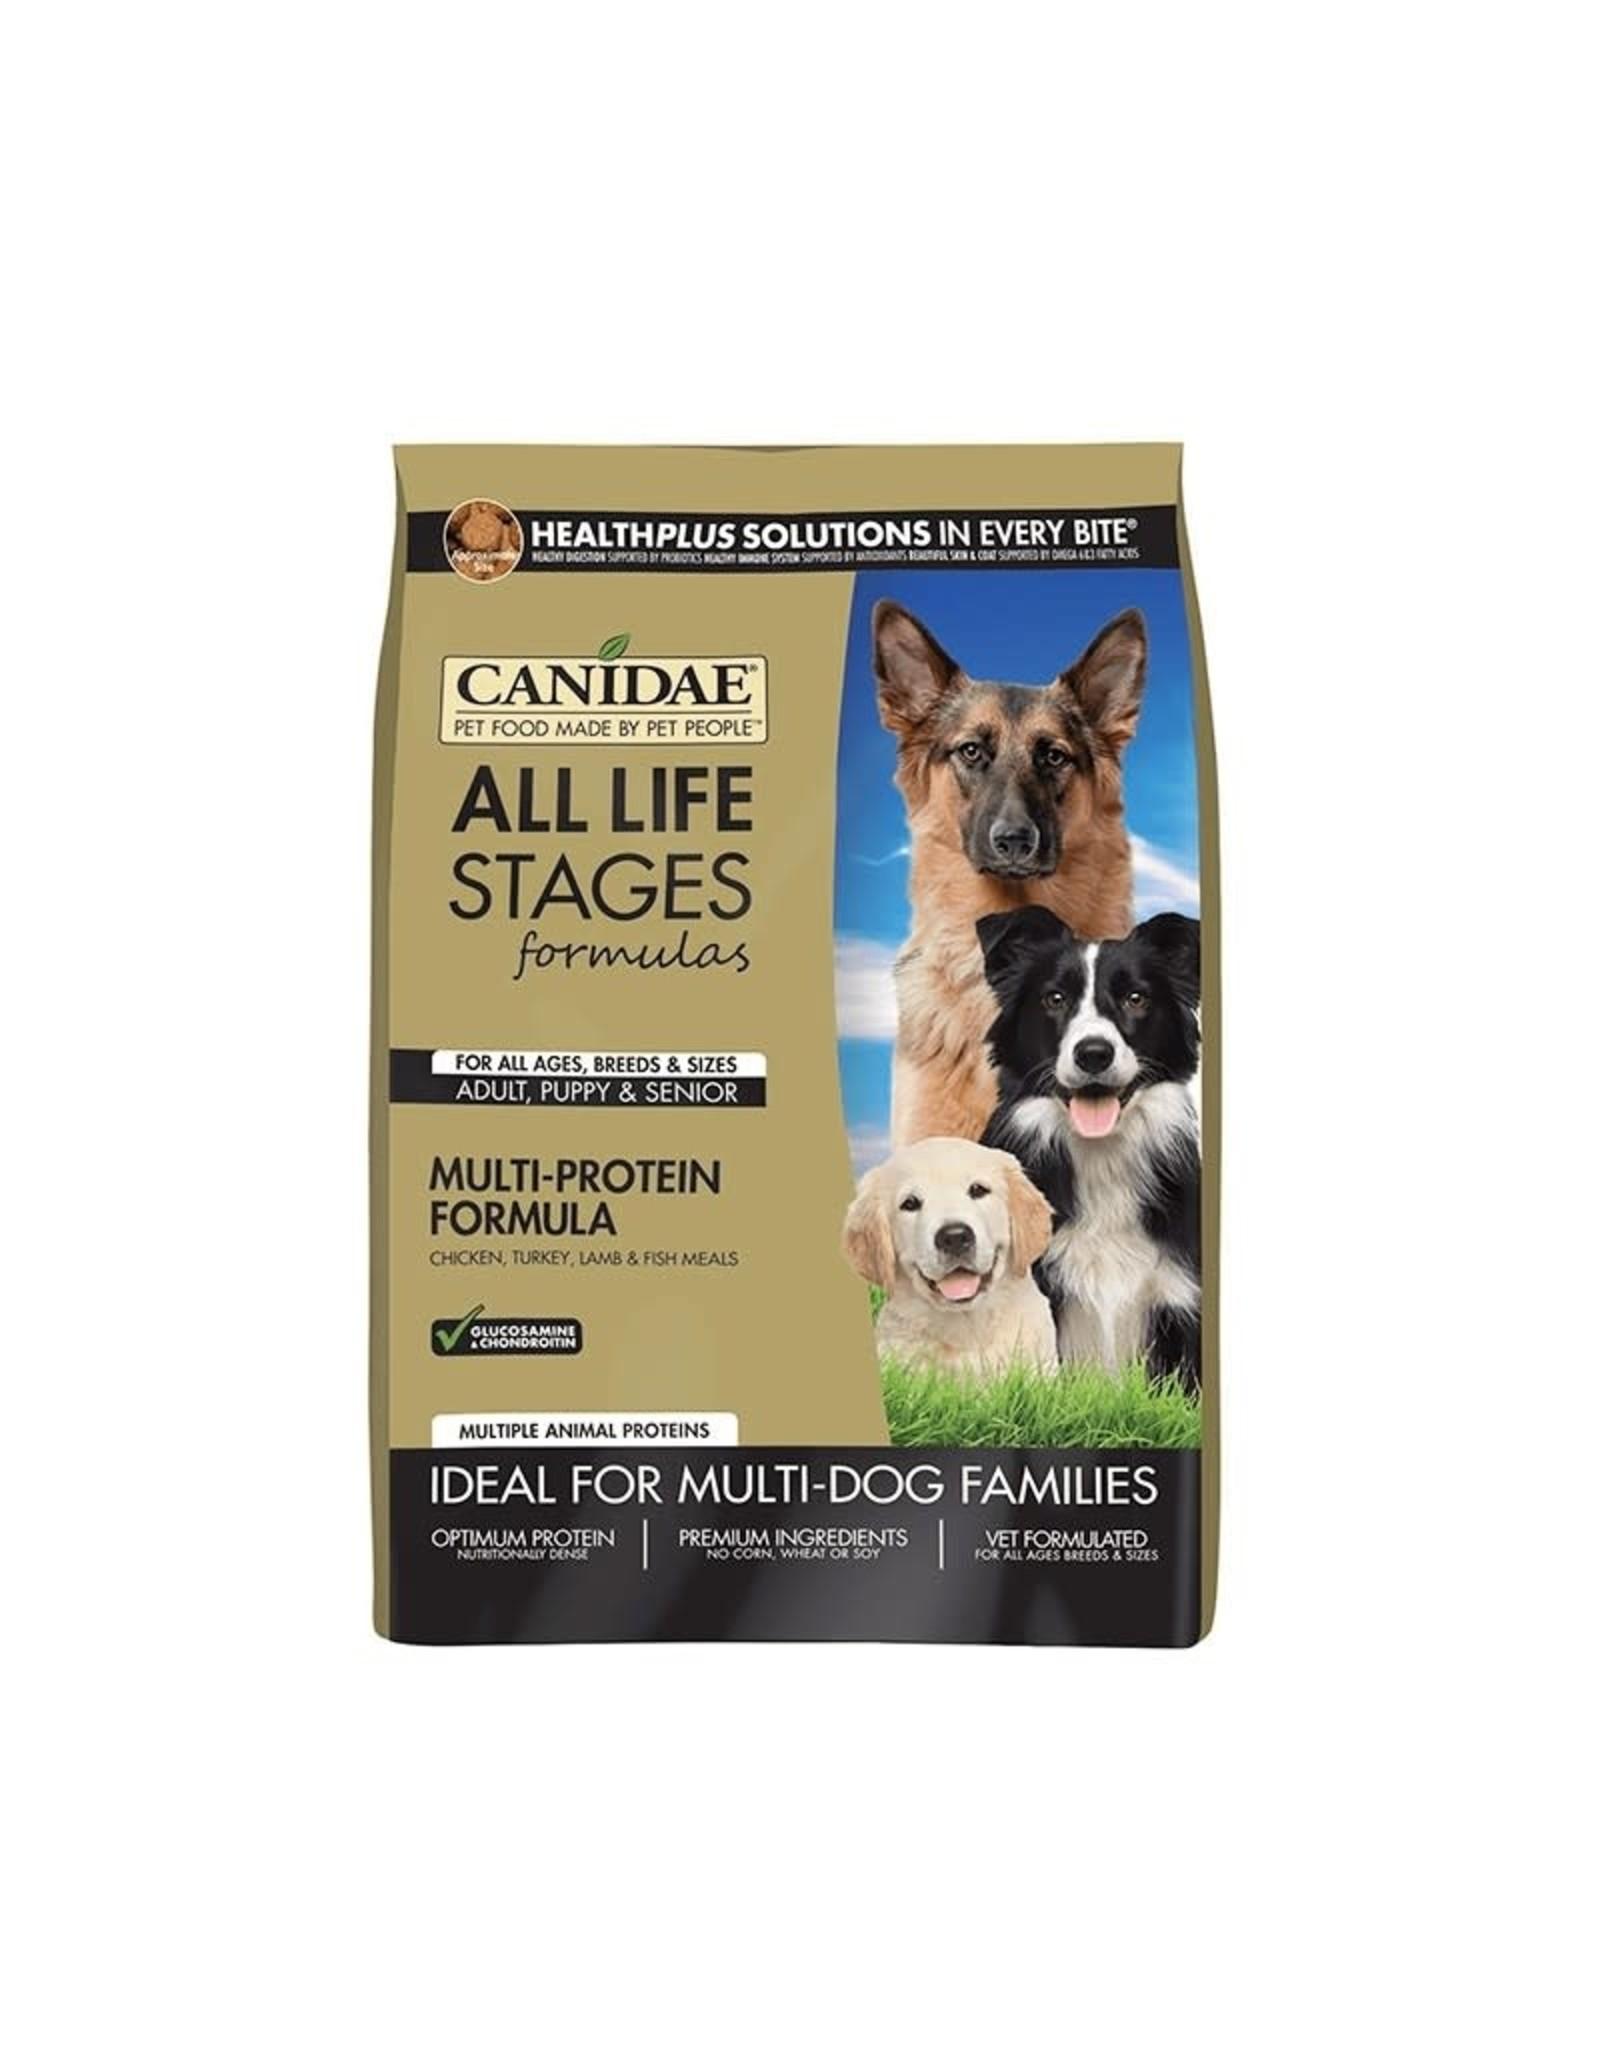 Canidae CANIDAE Multi-Protien ALS 30#